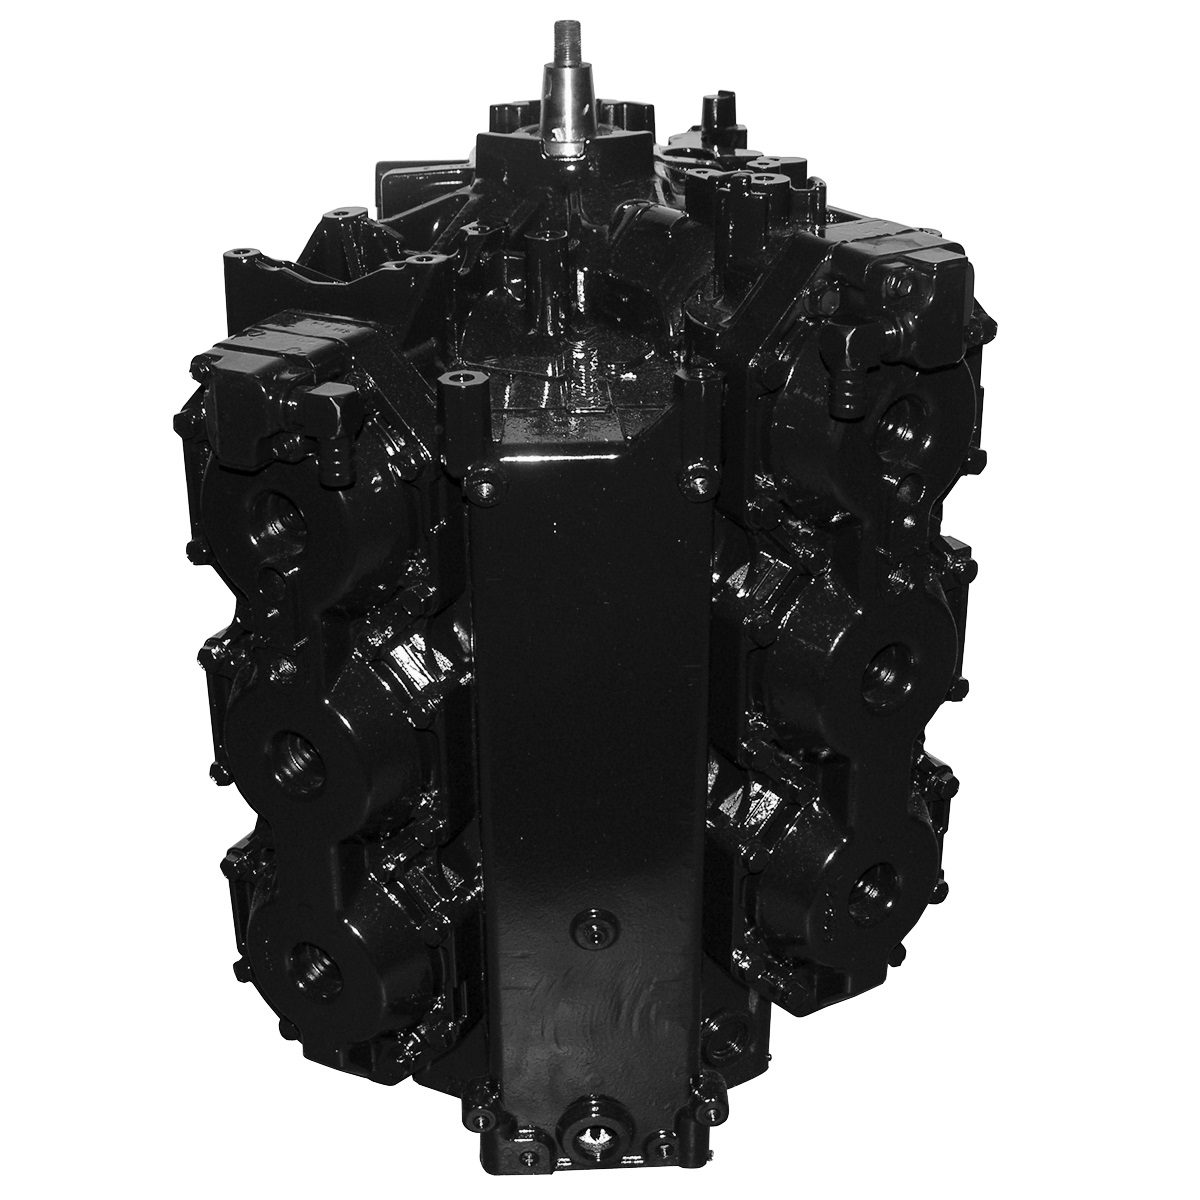 hight resolution of category merc 6 cyl powerheads jpg